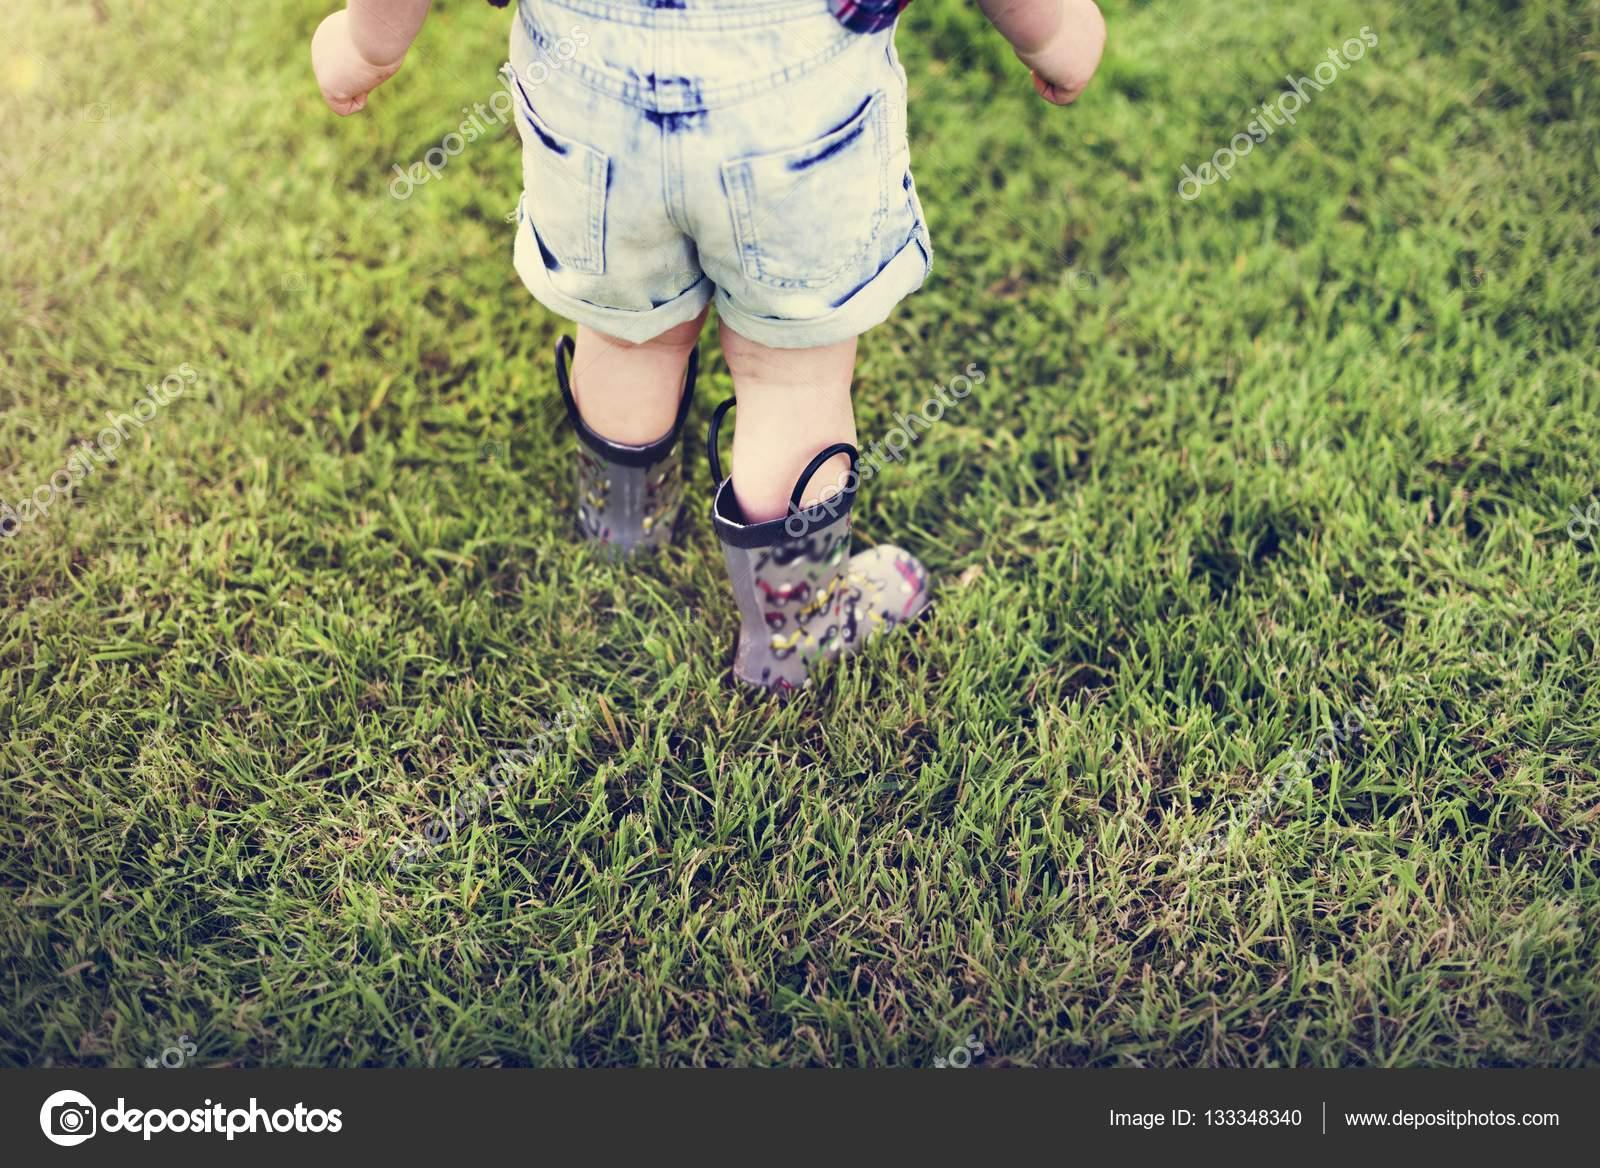 Klein kind lopen op gras u2014 stockfoto © rawpixel #133348340